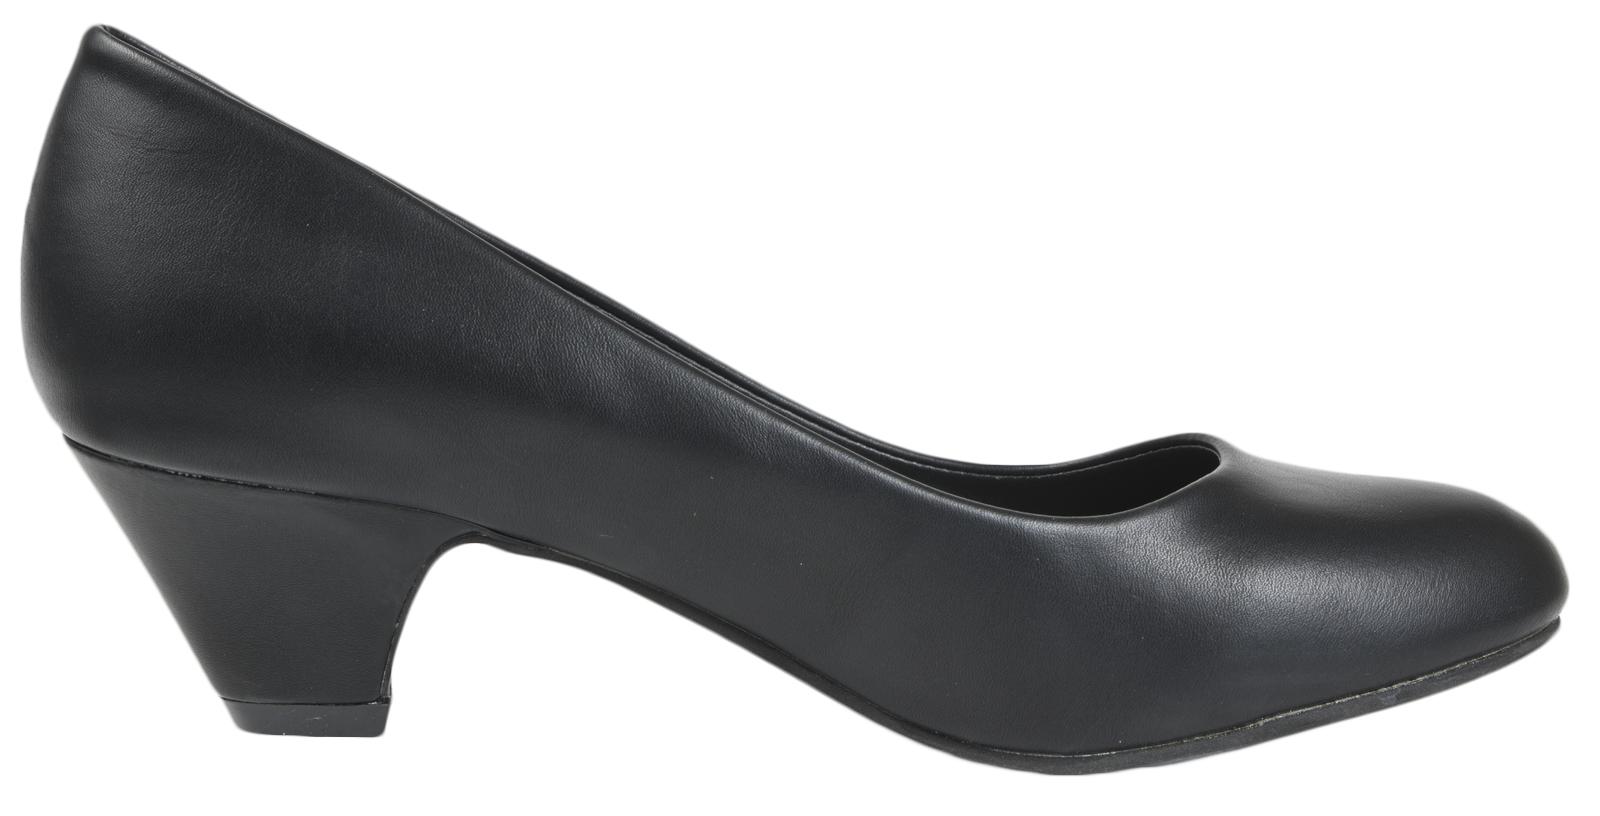 Ladies-Leather-Lined-Low-Block-Heels-Comfort-Work-Office-Court-Shoes-Ladies-Size miniatuur 16